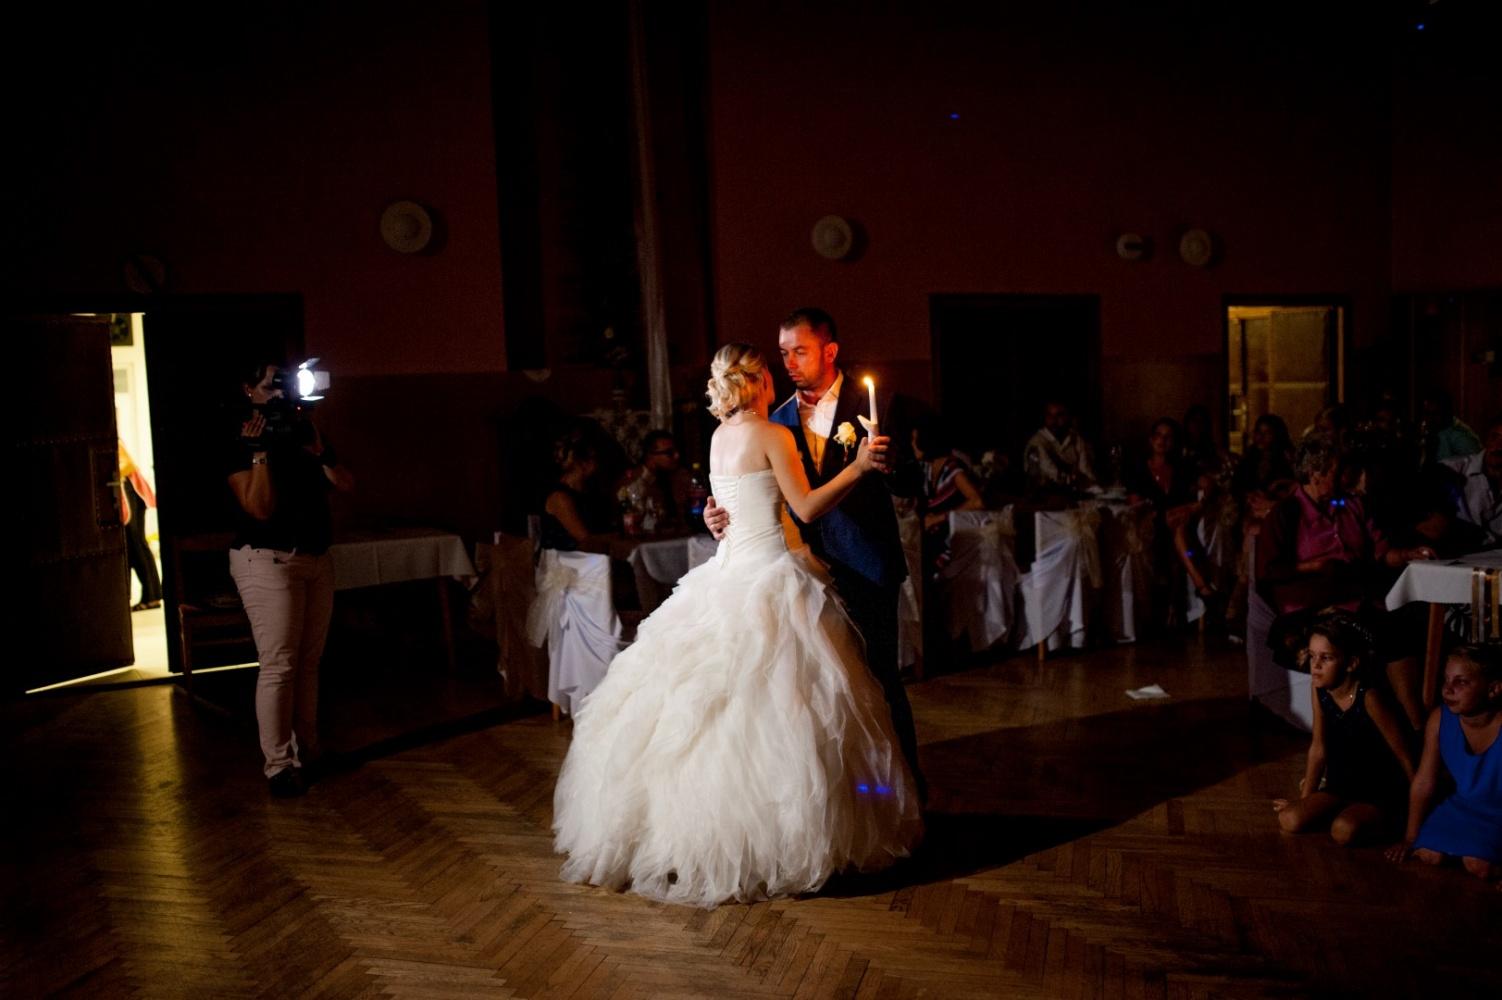 http://www.fotoz.sk/images/gallery-21/normal/svadobne-fotenie_eskuvoi-fotos_366.jpg